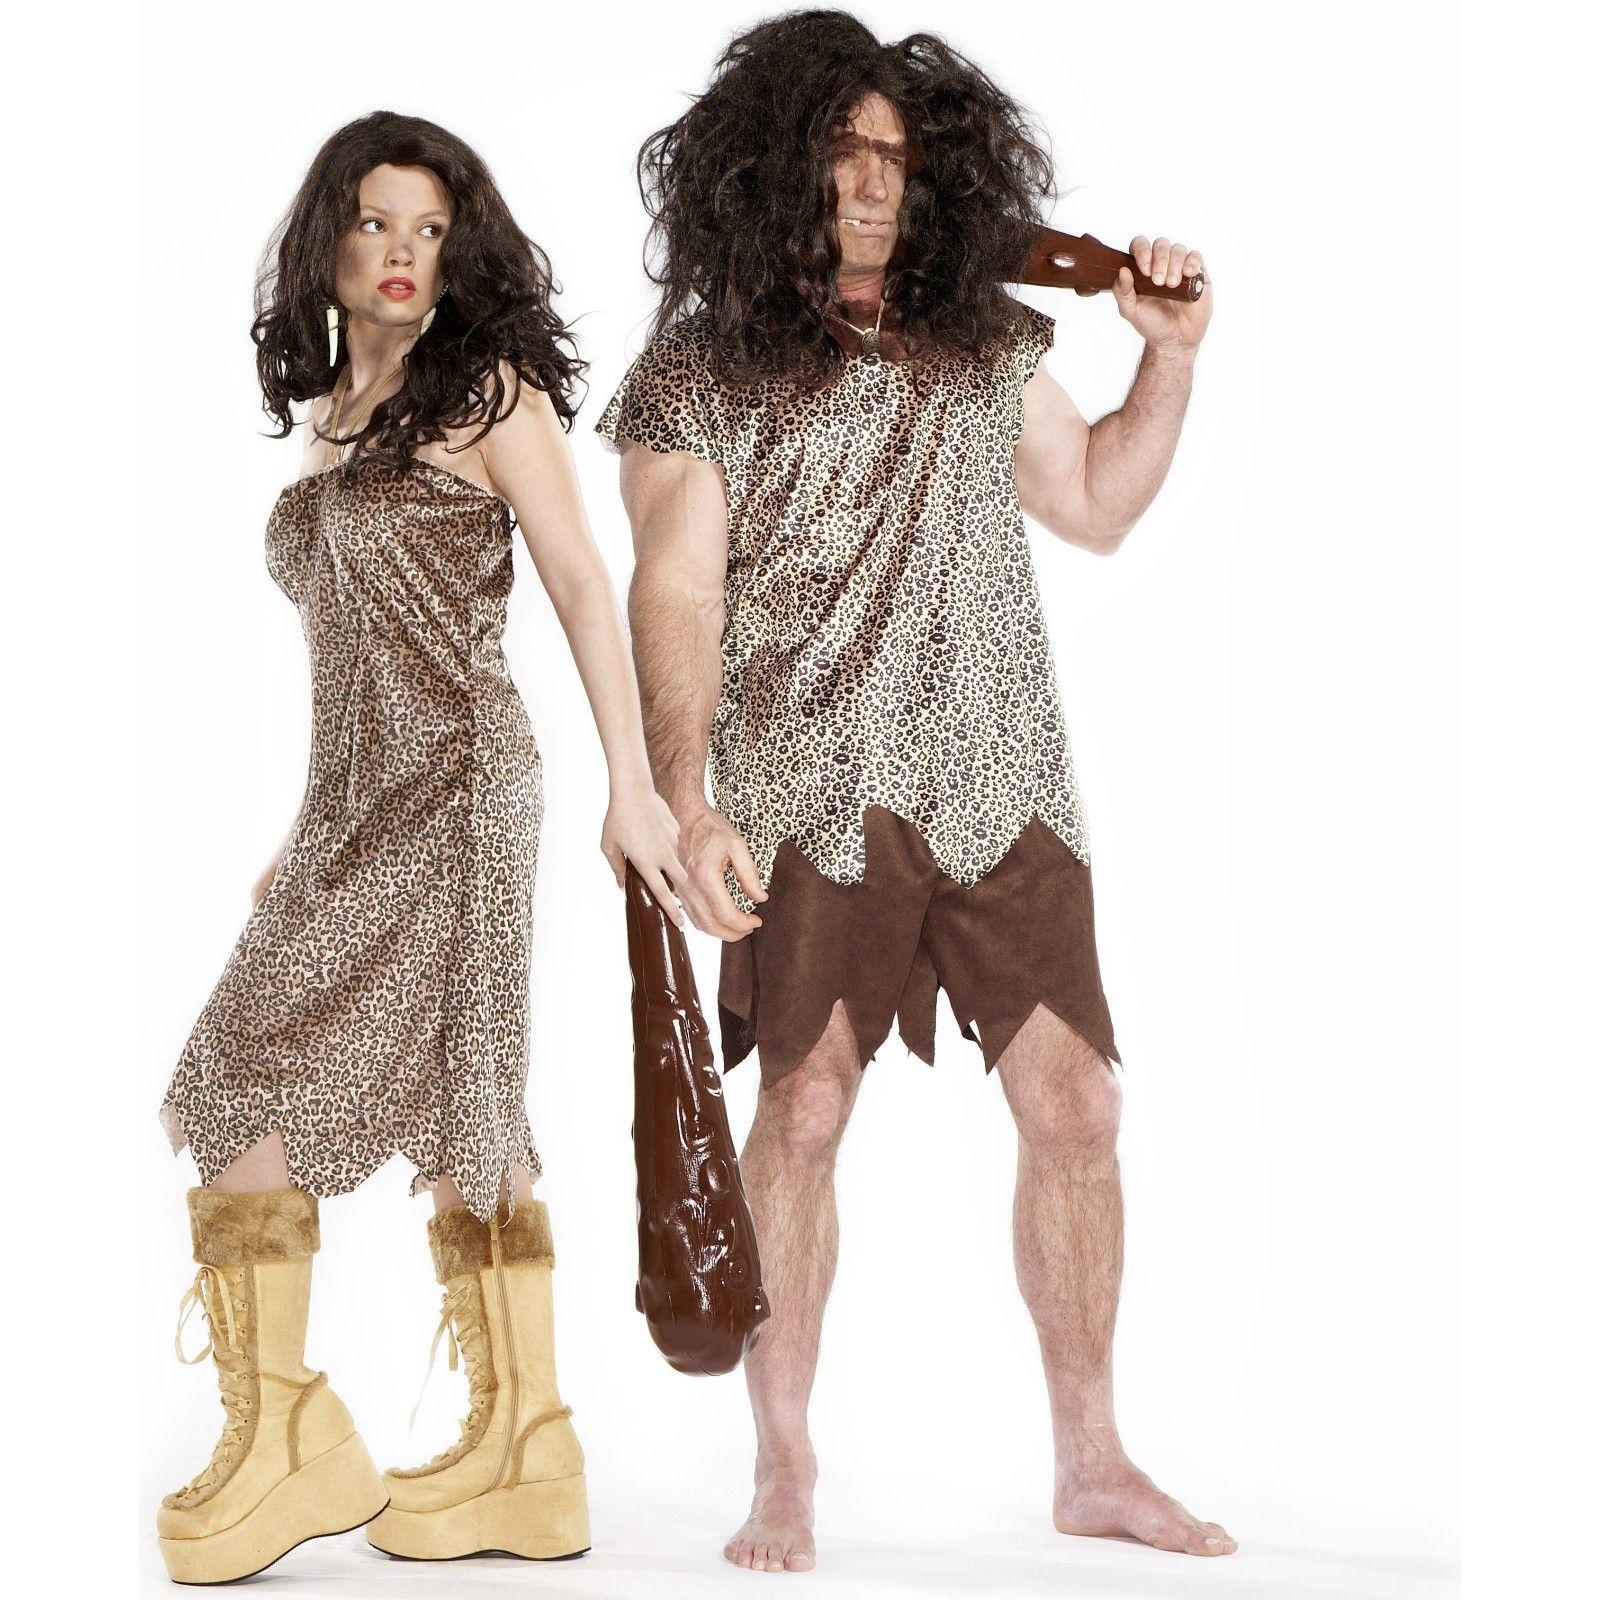 Cave Stud Adult Costume | Costumes, Caveman costume and Halloween ...